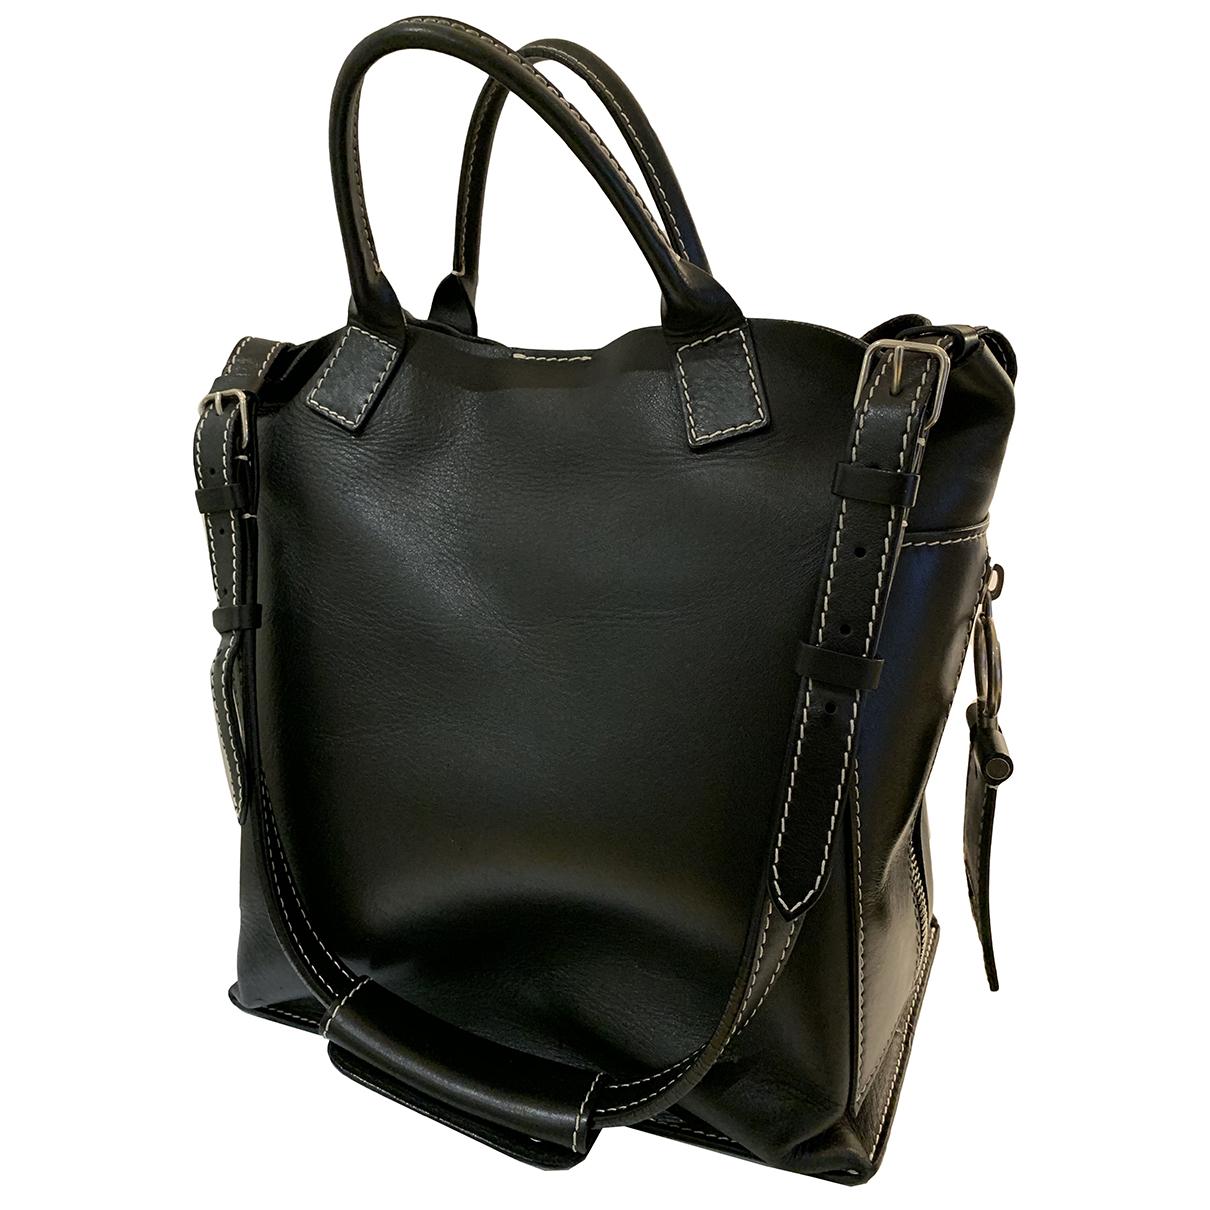 Acne Studios N Black Leather handbag for Women N